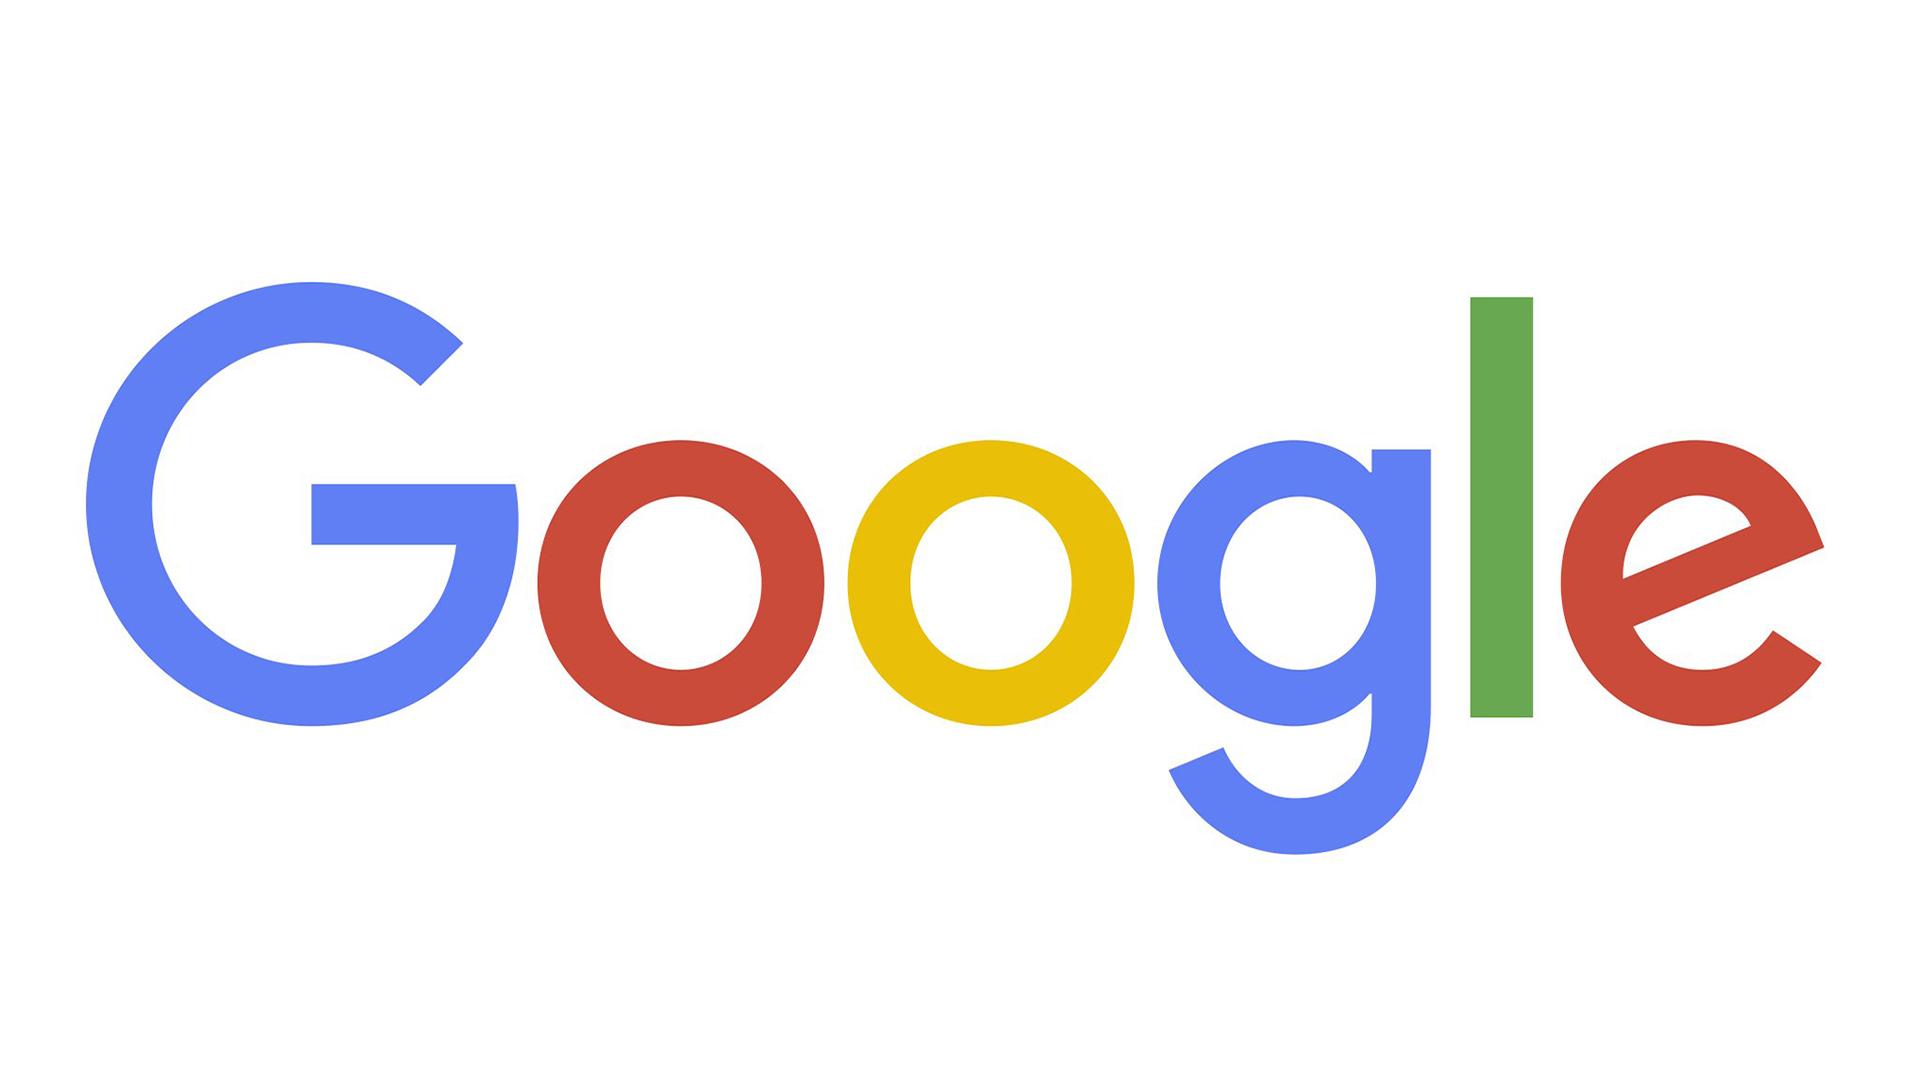 Google Graphic Zoomed-159532.jpg97328266